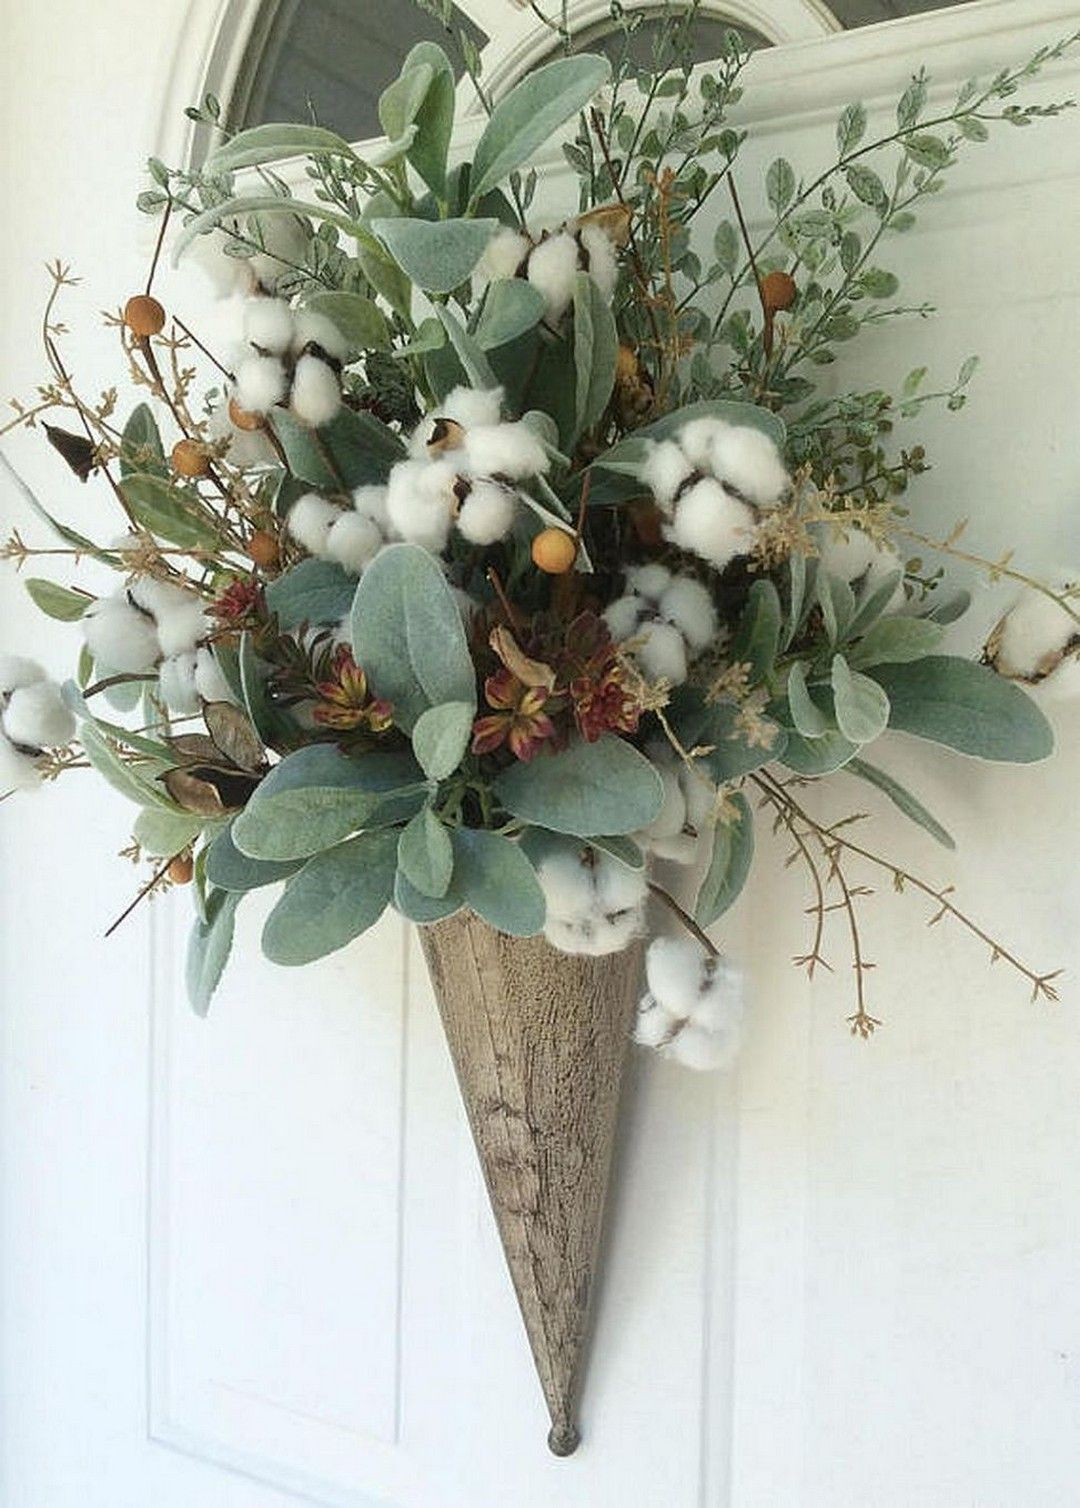 Incredible Cotton Decor Farmhouse That You'll Love it - House & Living